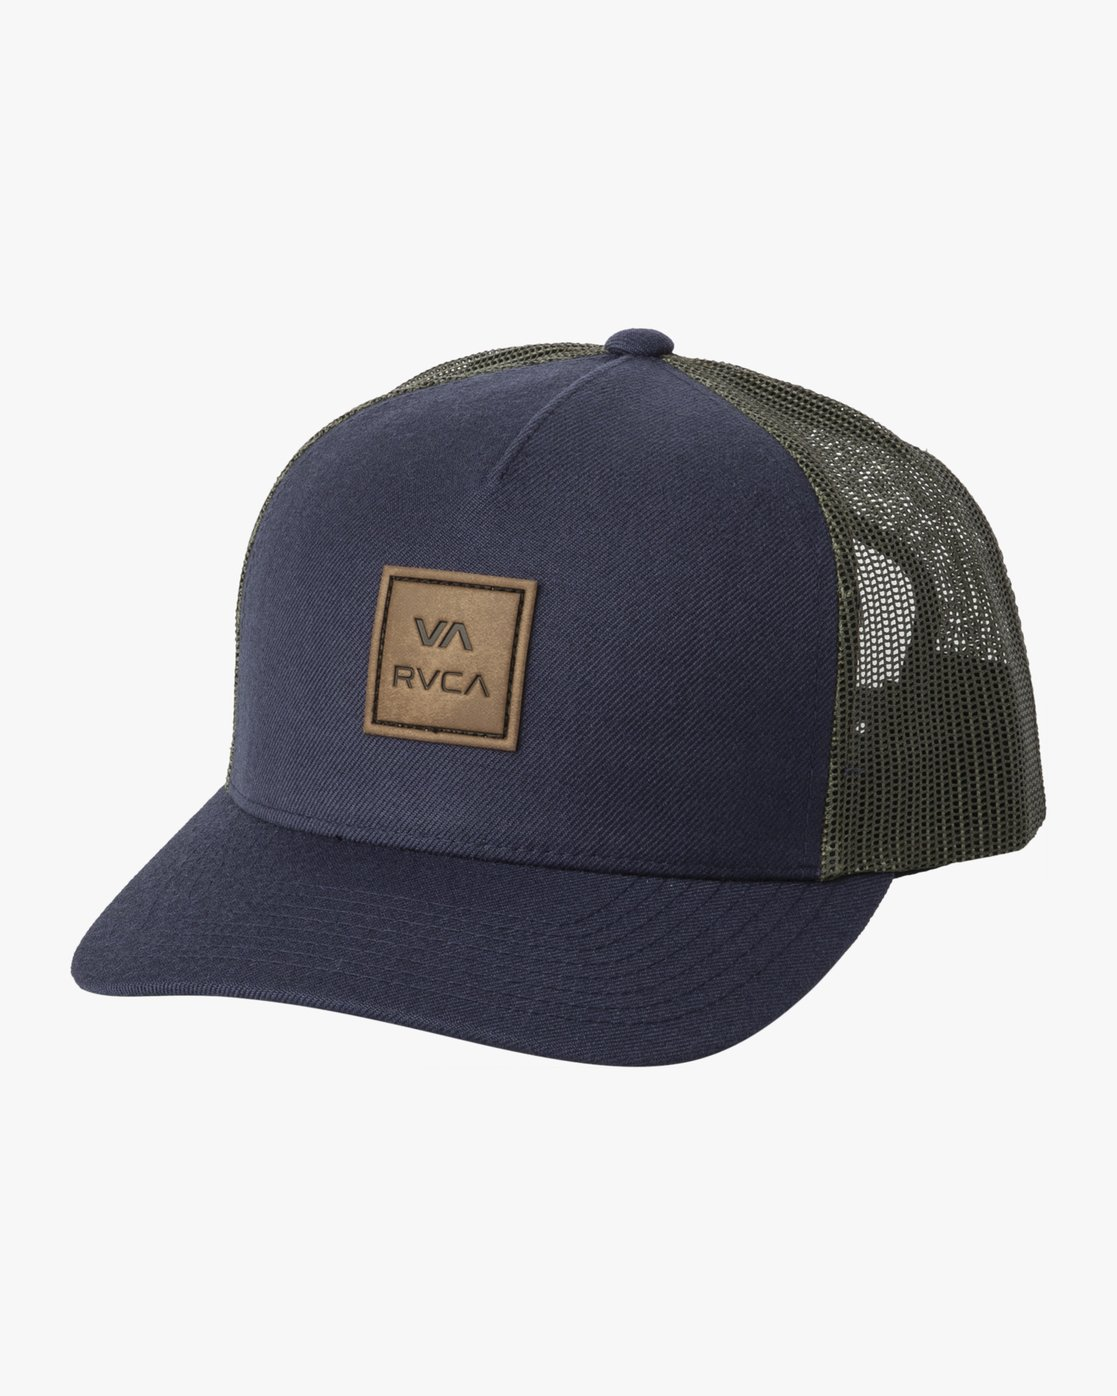 1 VA All The Way - Casquette trucker pour Homme Bleu U5CPSERVF0 RVCA